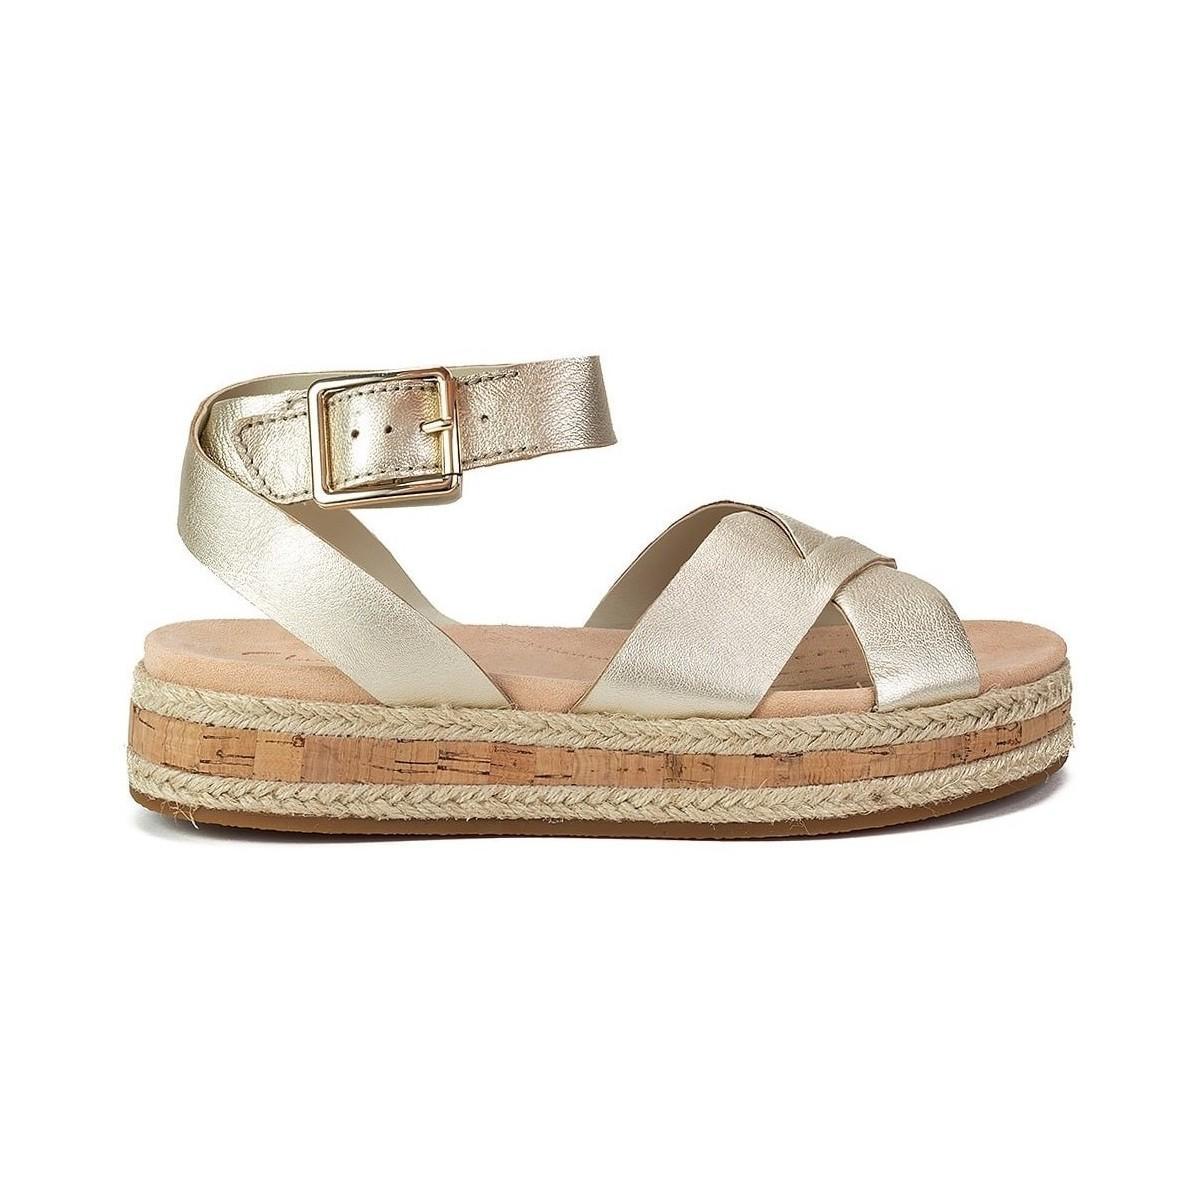 6dfba1fe3c64 Clarks Botanic Poppy Women s Sandals In Gold in Metallic - Lyst